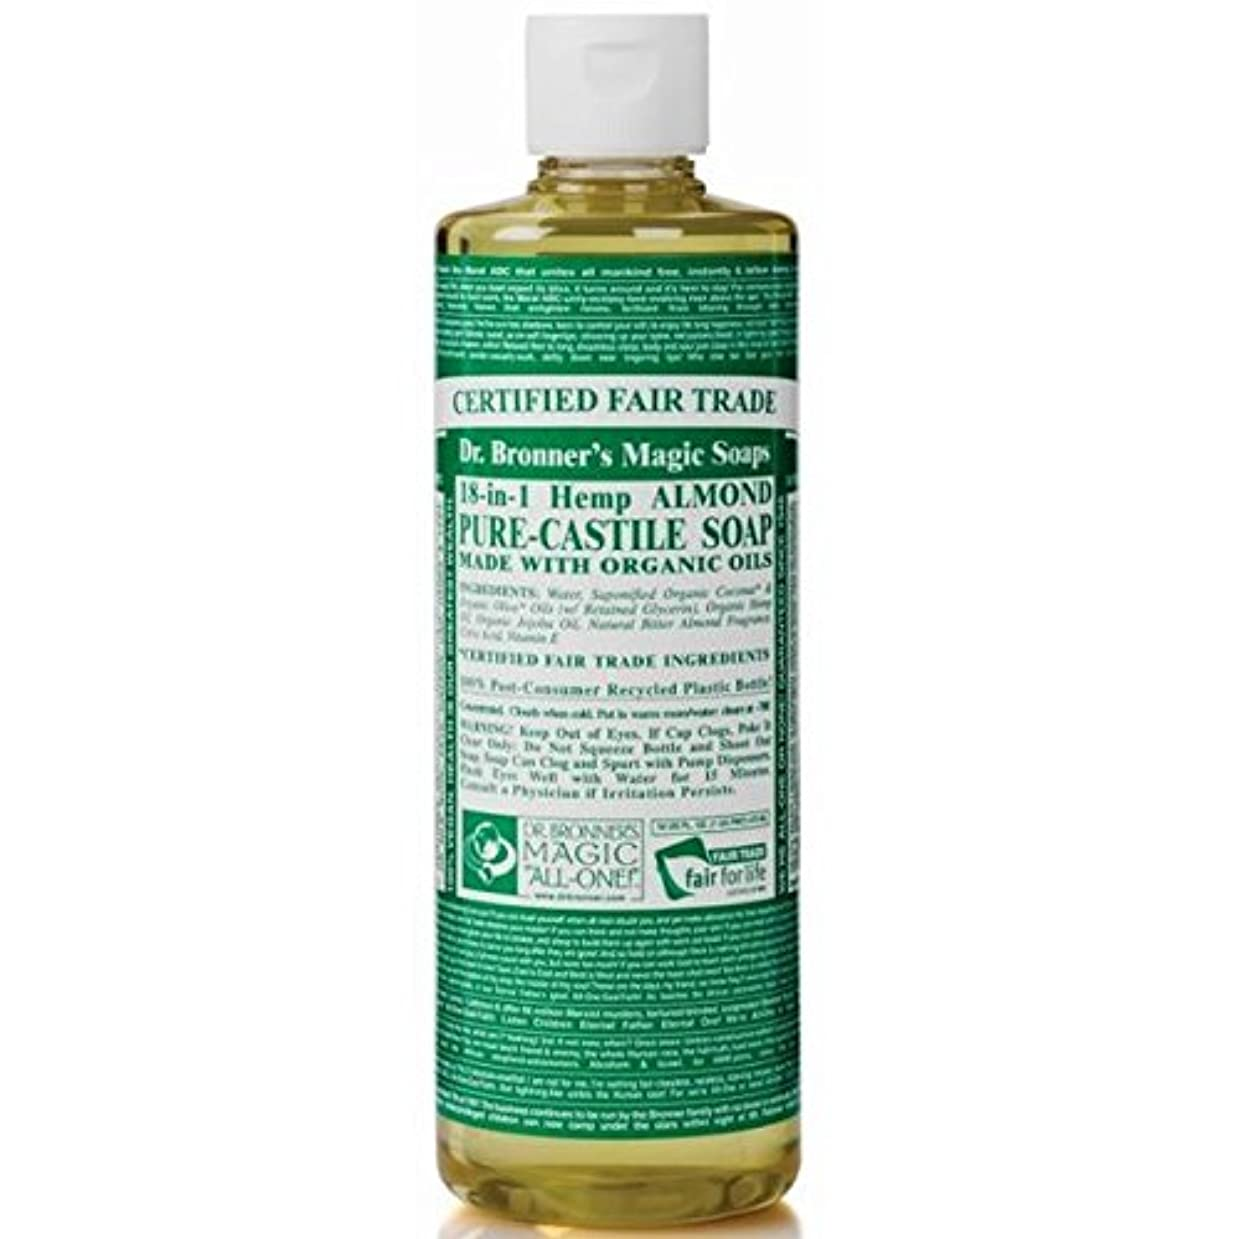 Dr Bronner Organic Almond Castile Liquid Soap 237ml - のブロナー有機アーモンドカスティーリャ液体石鹸237ミリリットル [並行輸入品]